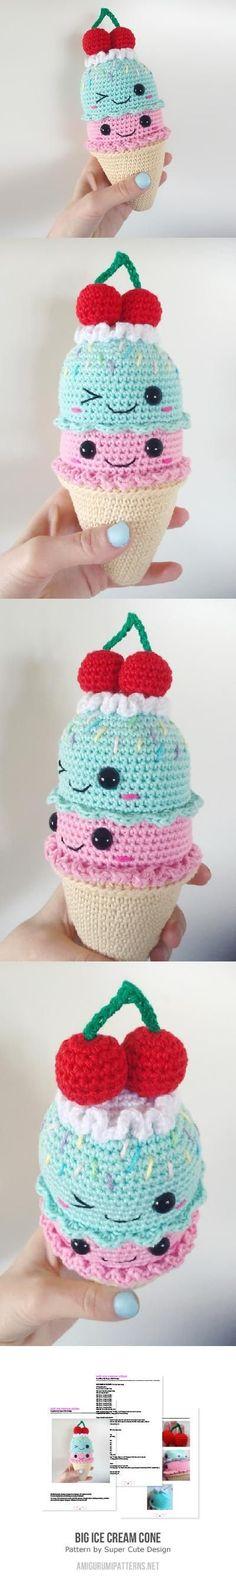 cutest kawaii ice cream cone crochet amigurumi mini friend with a cherry on top Big Ice Cream Cone Amigurumi Pattern~ (Nova asked for the white bunny ice cream cone, and Zephyr wants a popsicle)